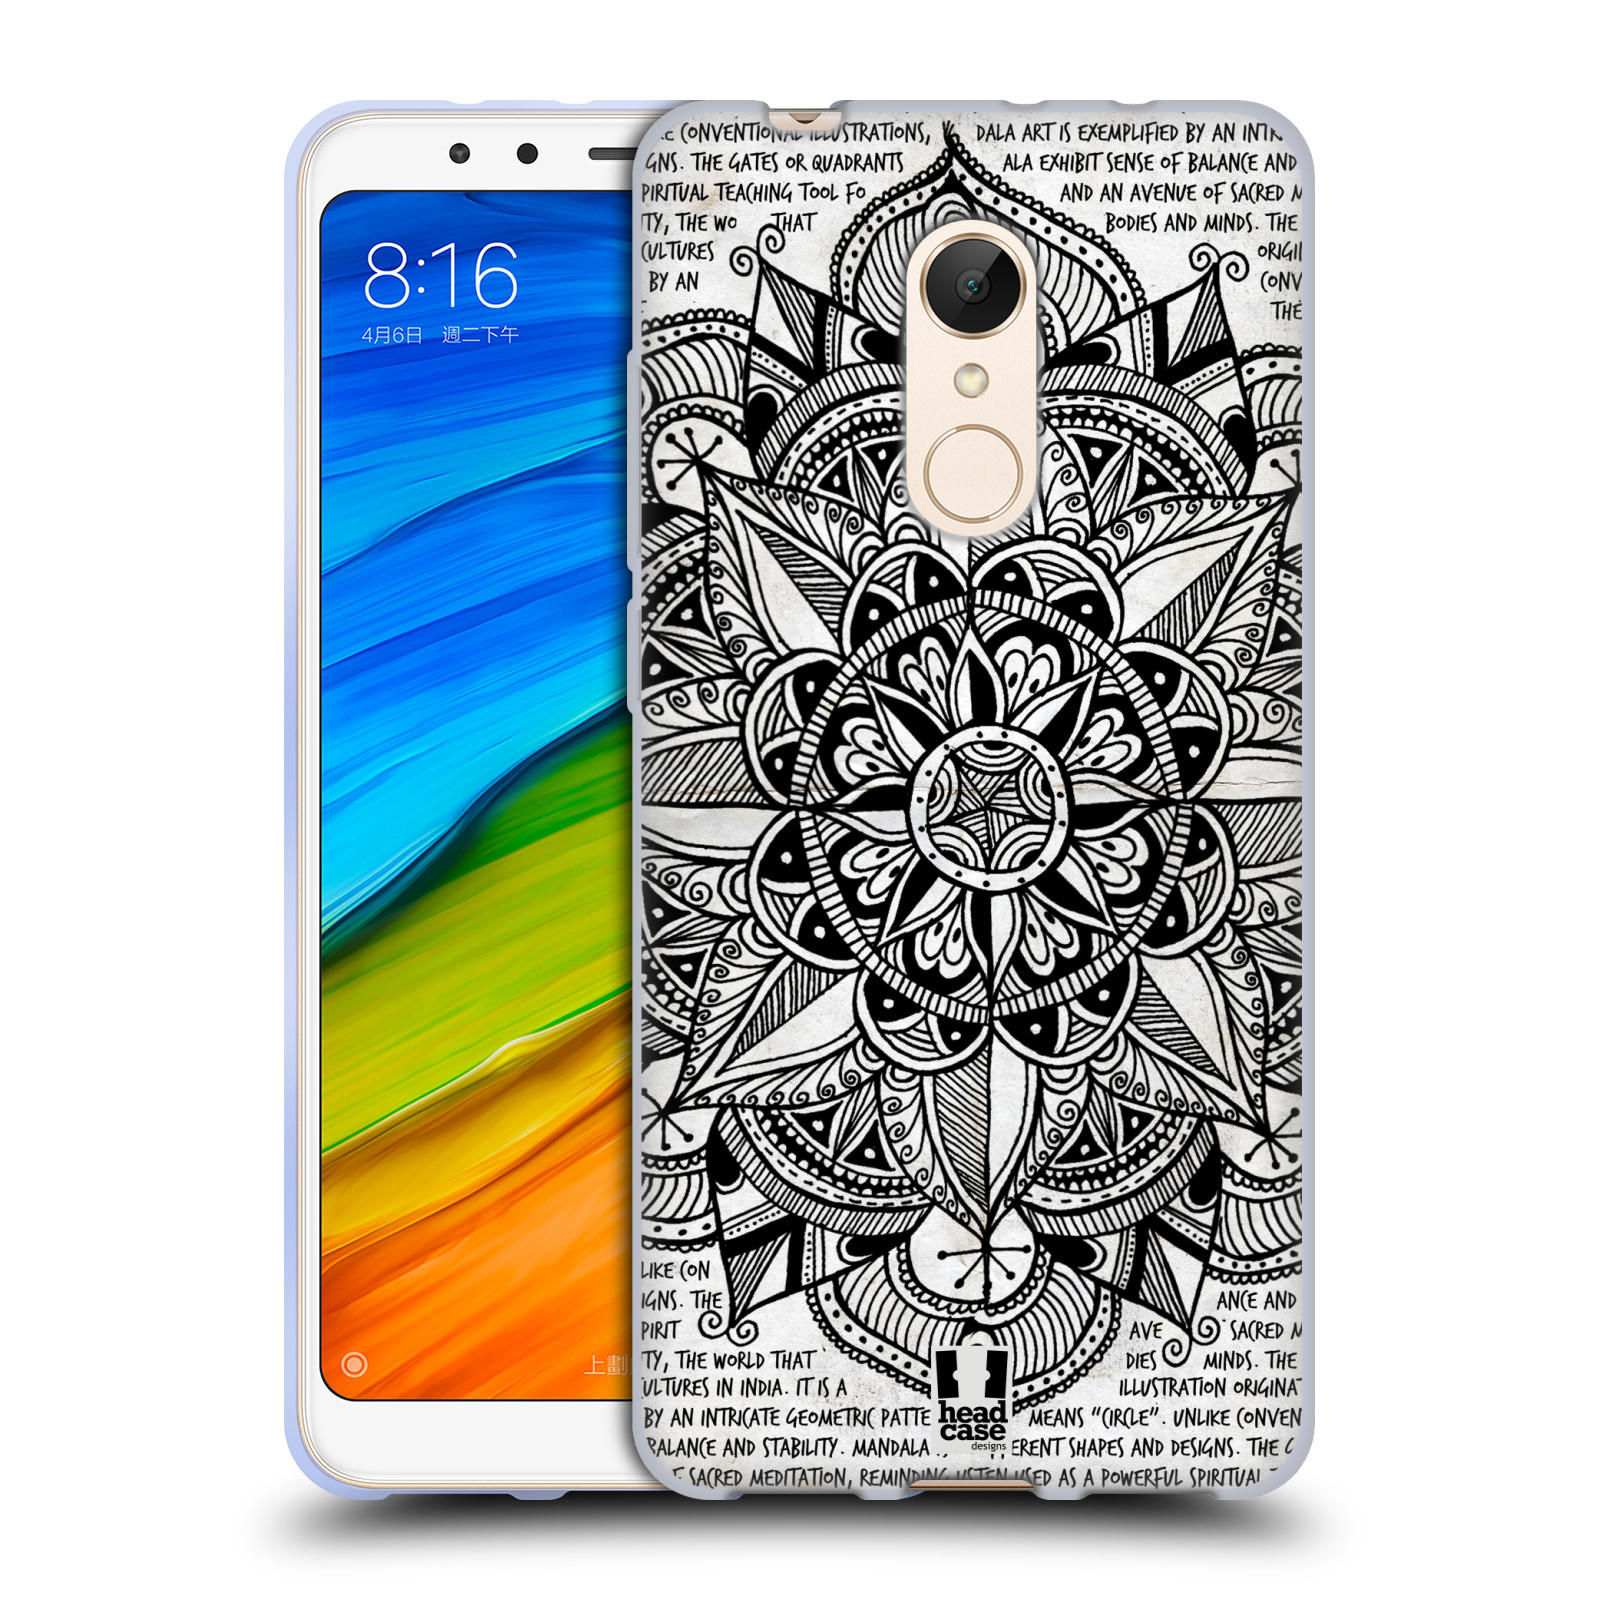 Silikonové pouzdro na mobil Xiaomi Redmi 5 - Head Case - Mandala Doodle Paper